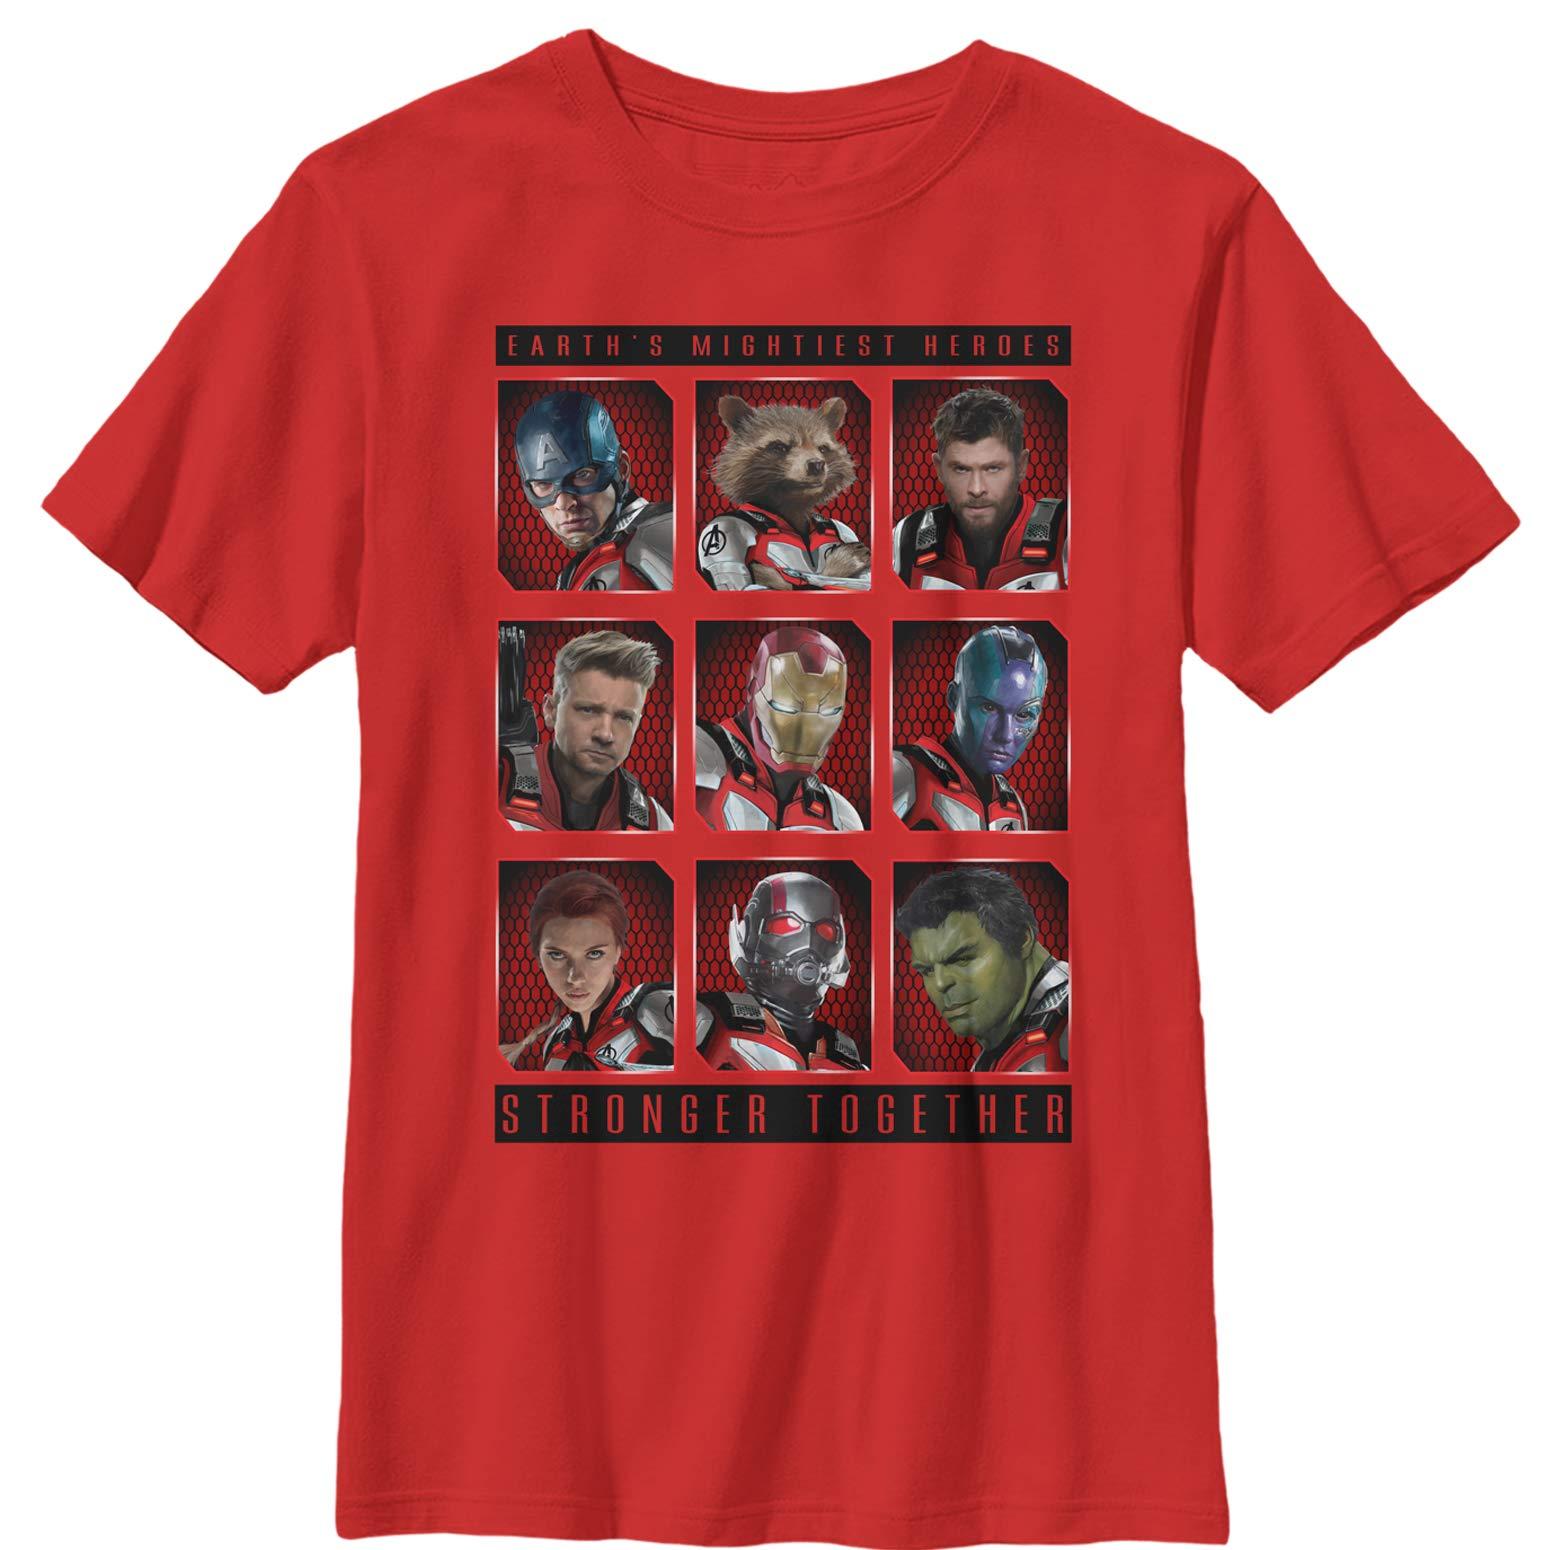 Endgame Stronger Together Bingo T Shirt 5572